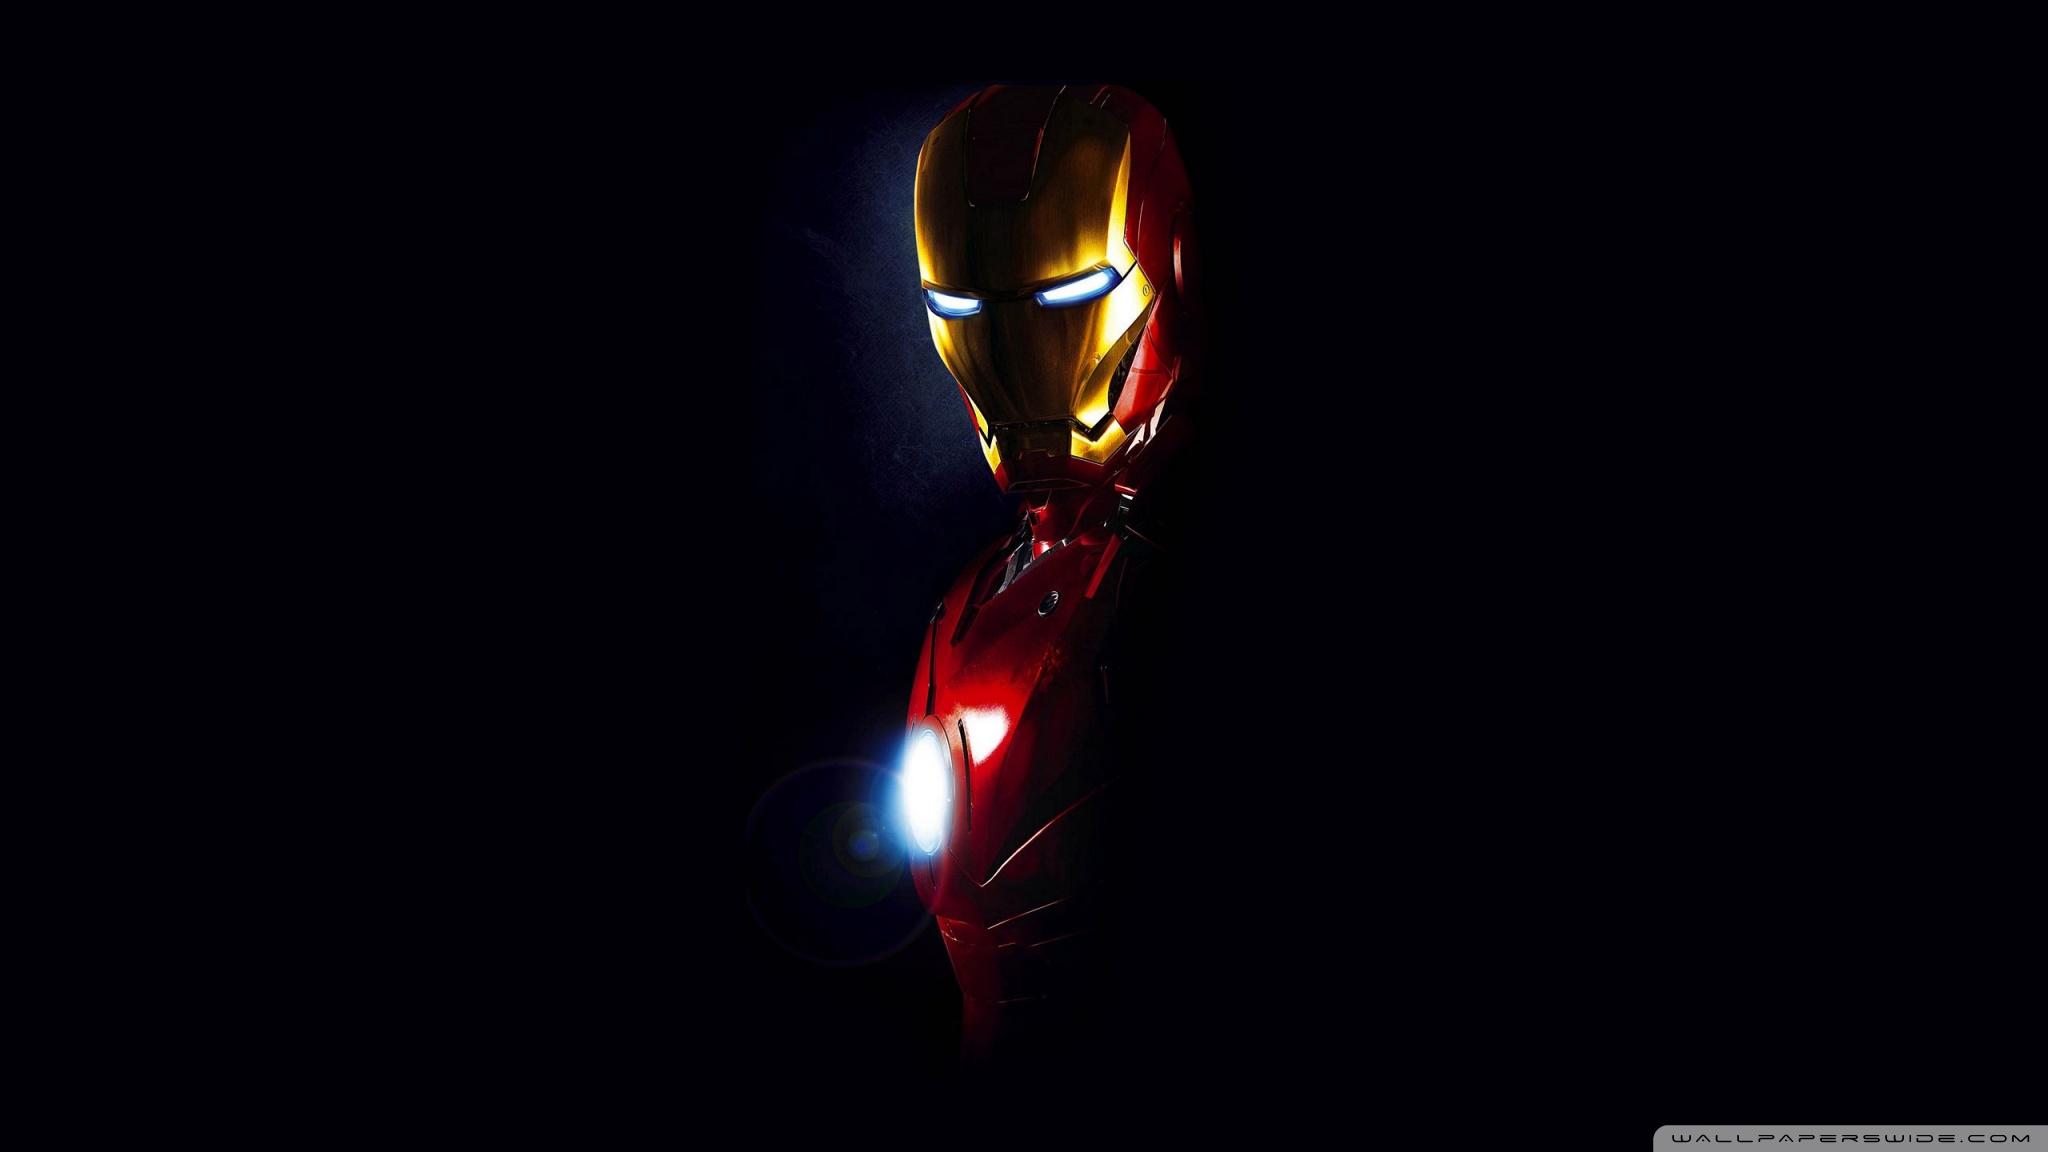 Iron Man Hd Wallpaper 2048x1152 43325